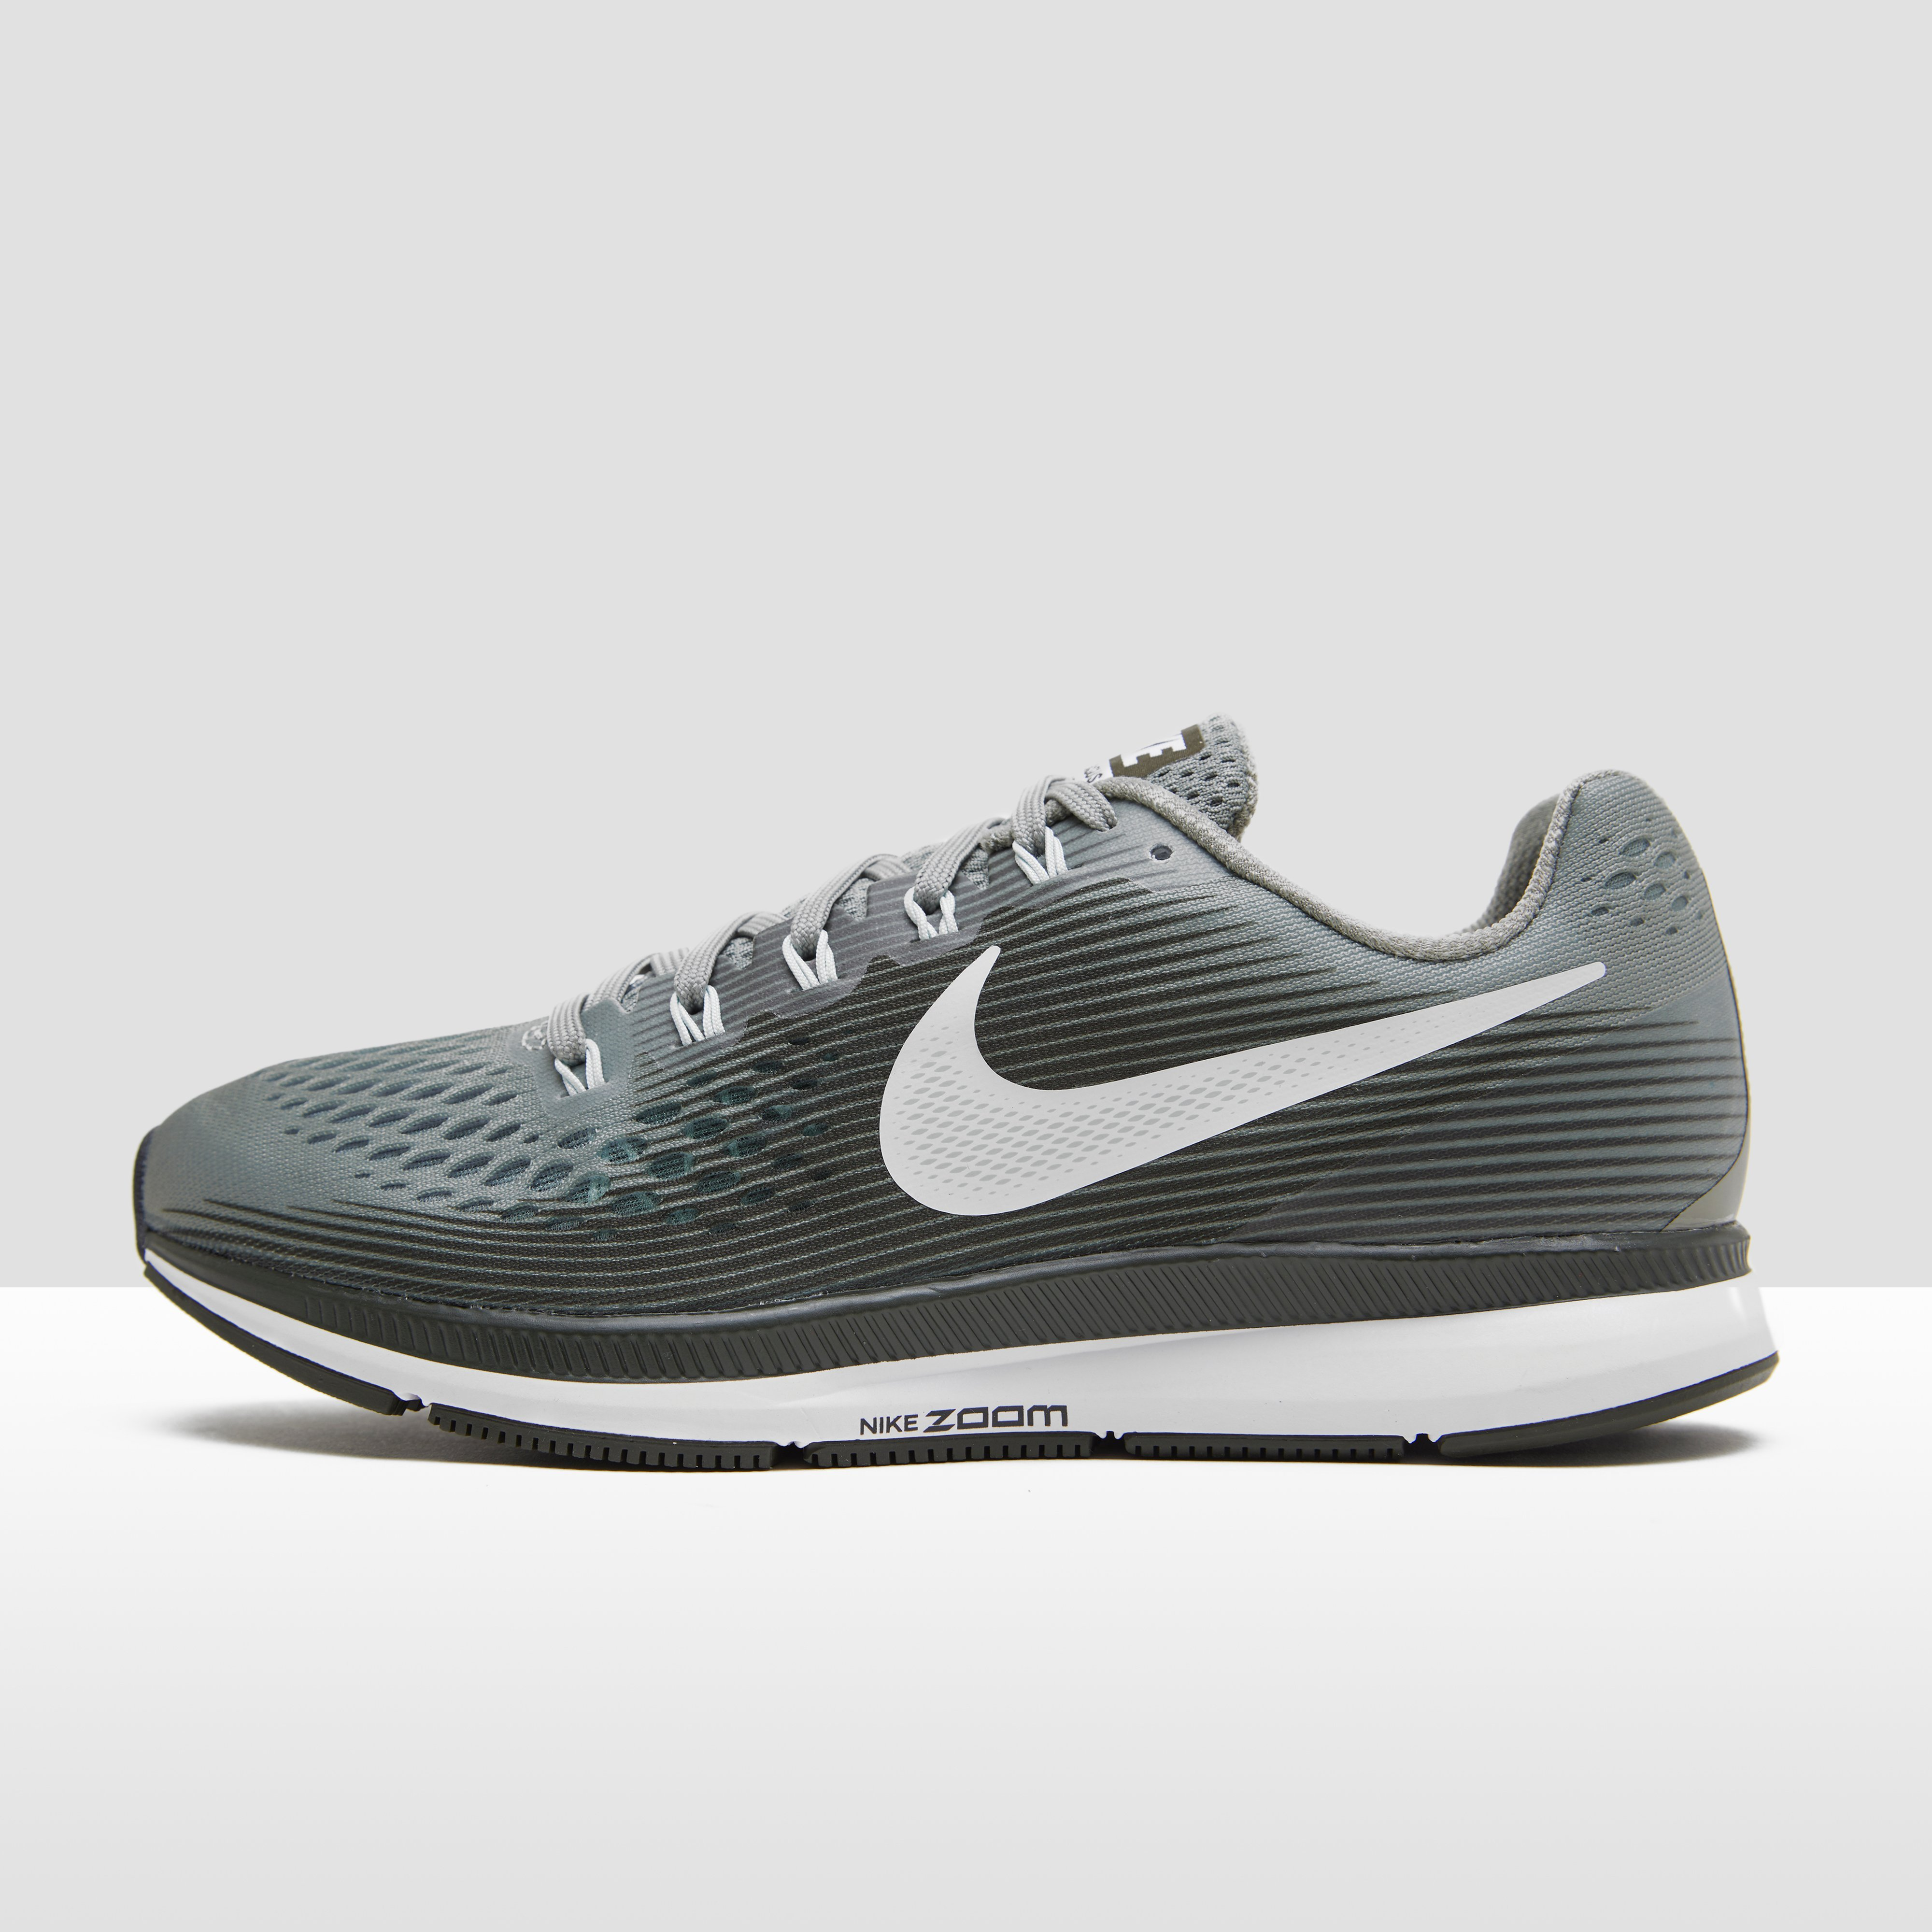 Nike - Zoom Air Pegasus 34 Chaussures Course - Femmes - Chaussures - Noir - 36,5